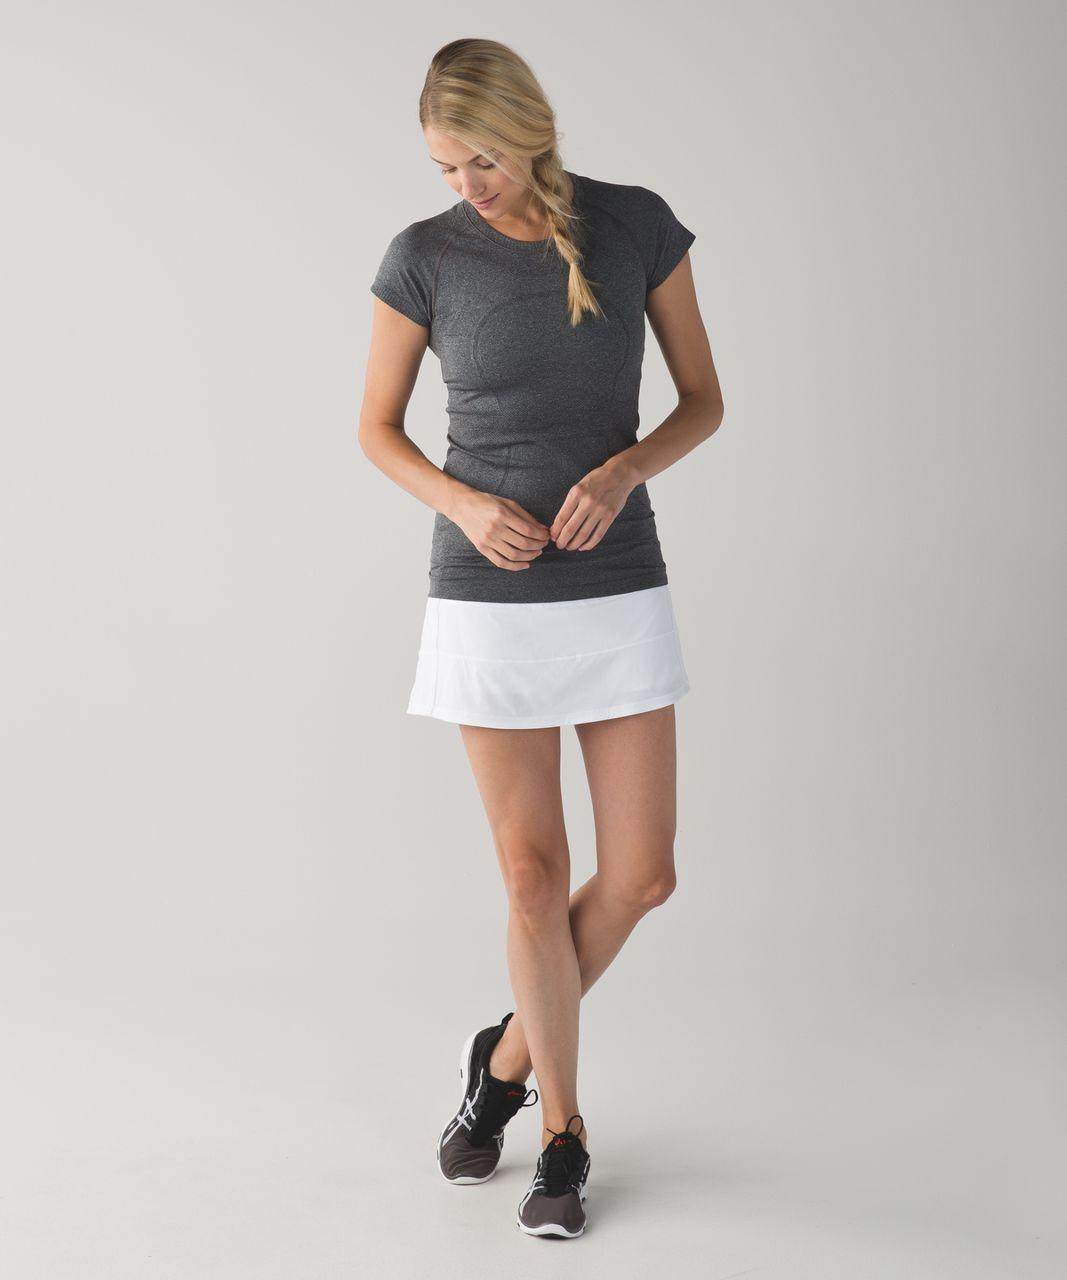 Lululemon Pace Rival Skirt II (Tall) - White